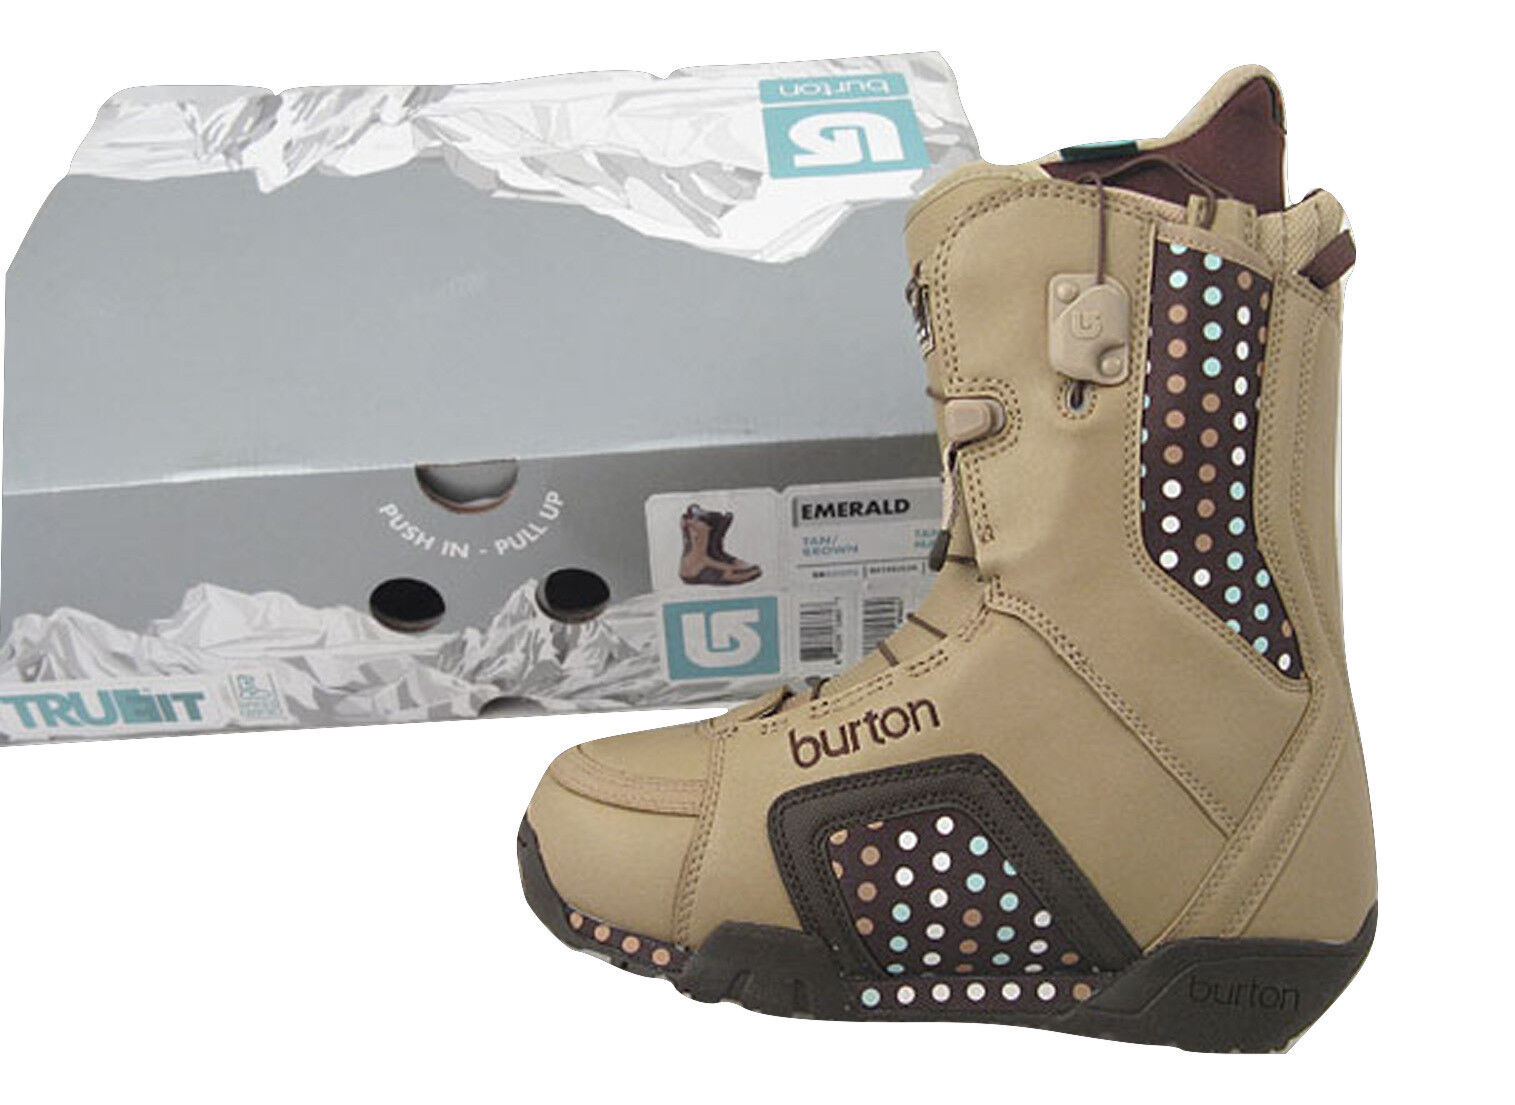 NEW Burton Emerald Snowboard Stiefel   US 4, UK 2.5, Euro 34, Mondo 21  Tan braun